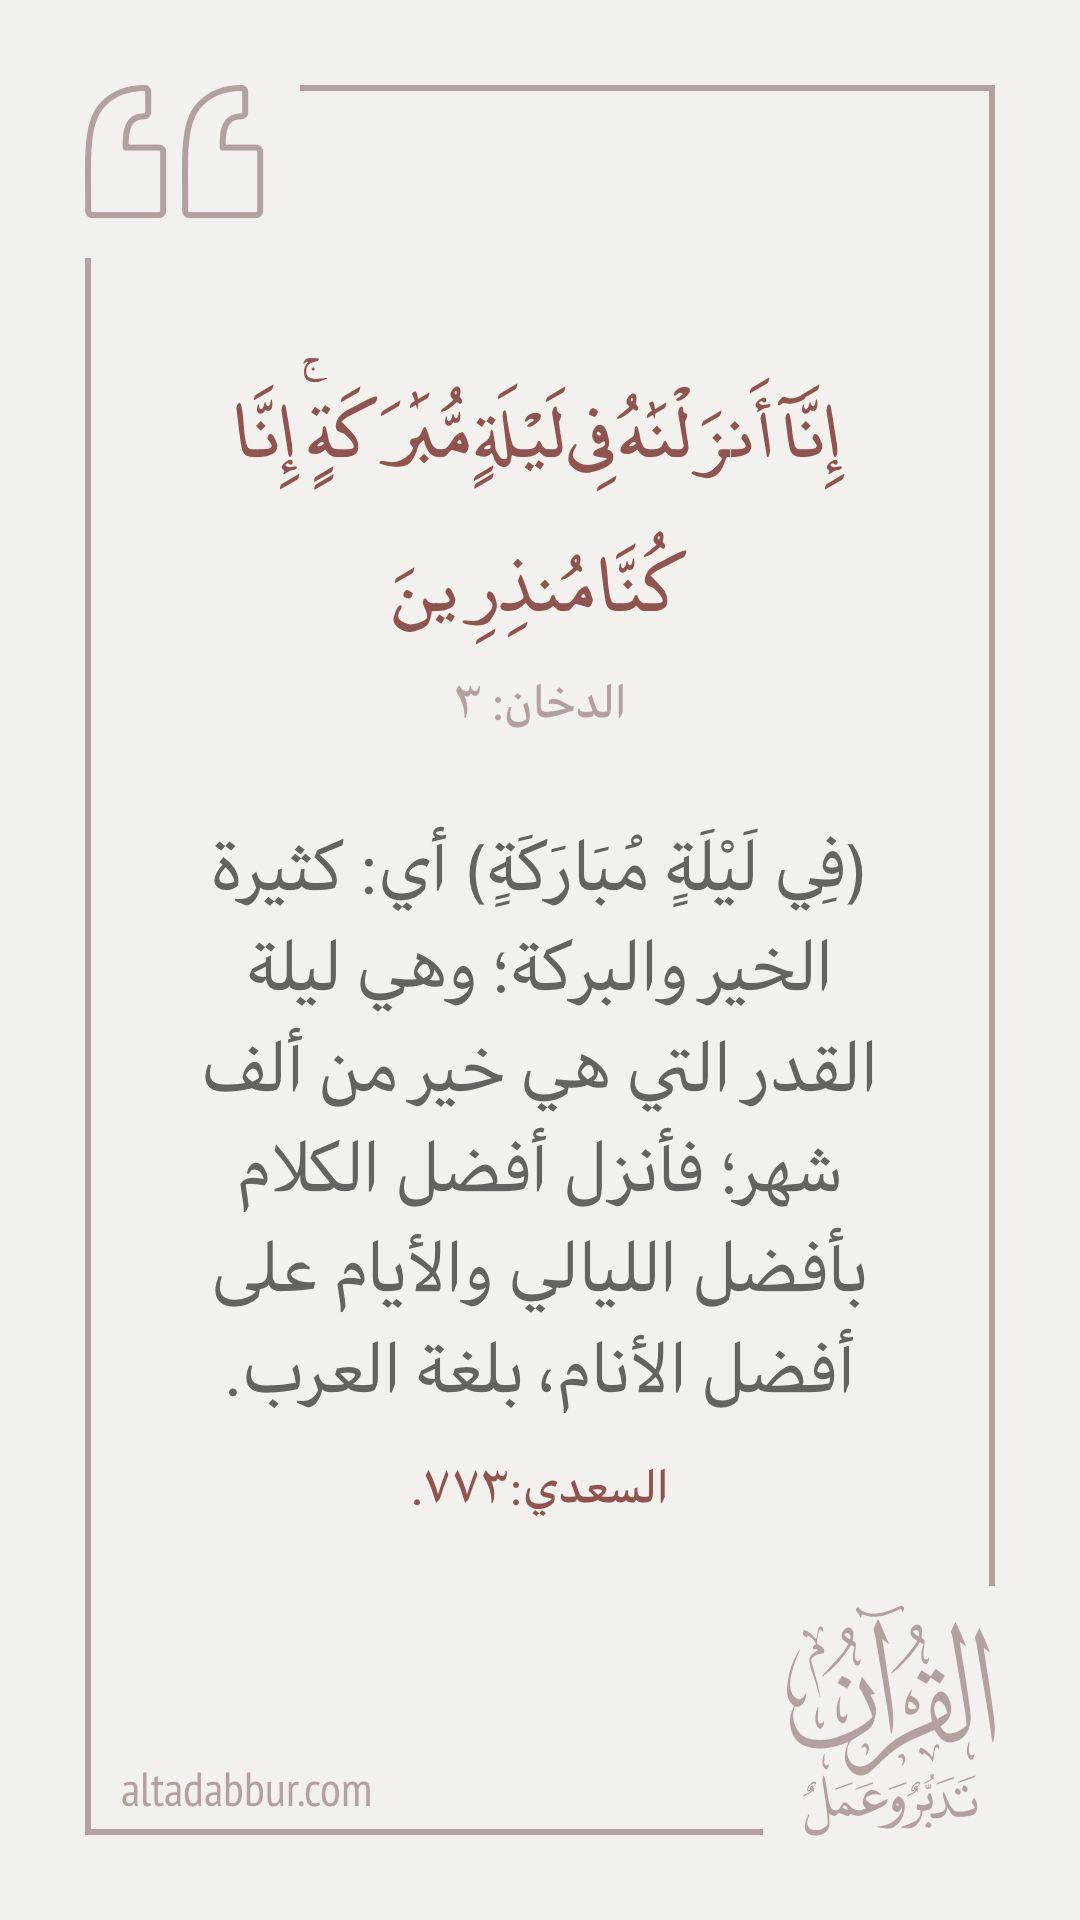 Pin By Eslam Hisn On قرآن تفسير وتدب ر Quran Book New Quotes Islamic Quotes